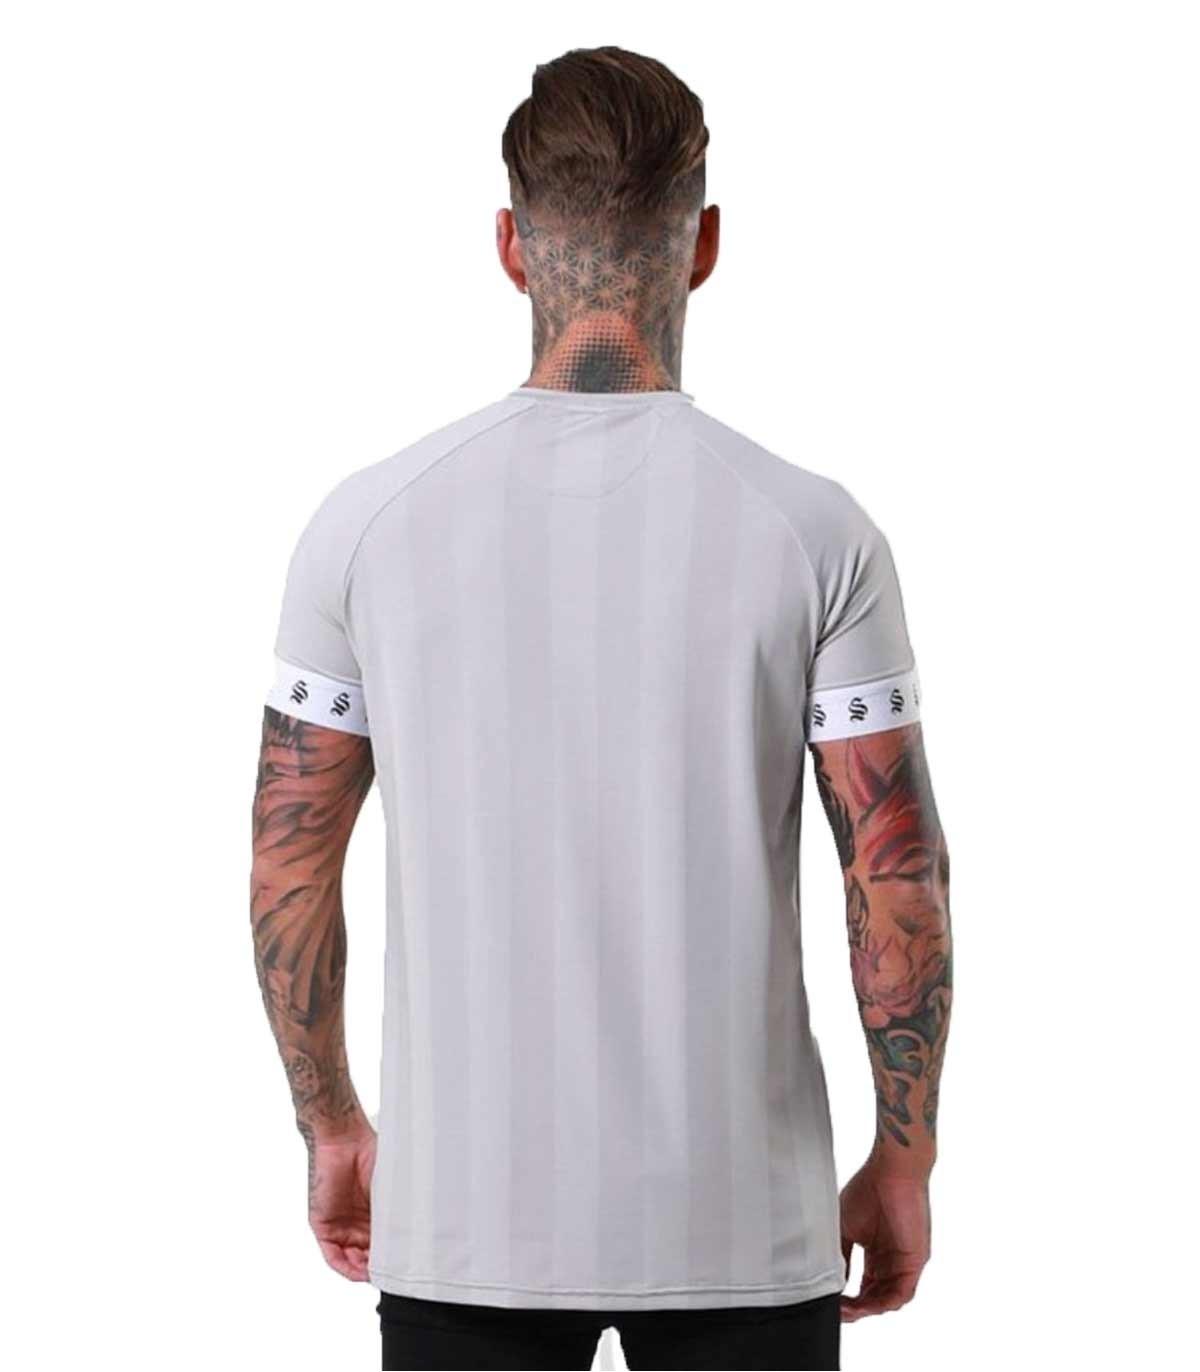 Cali Tee Tee Camiseta Sinners Camiseta Camiseta Sinners Cali Sinners Cali Tee Camiseta Sinners Cali jzpGqVSMLU